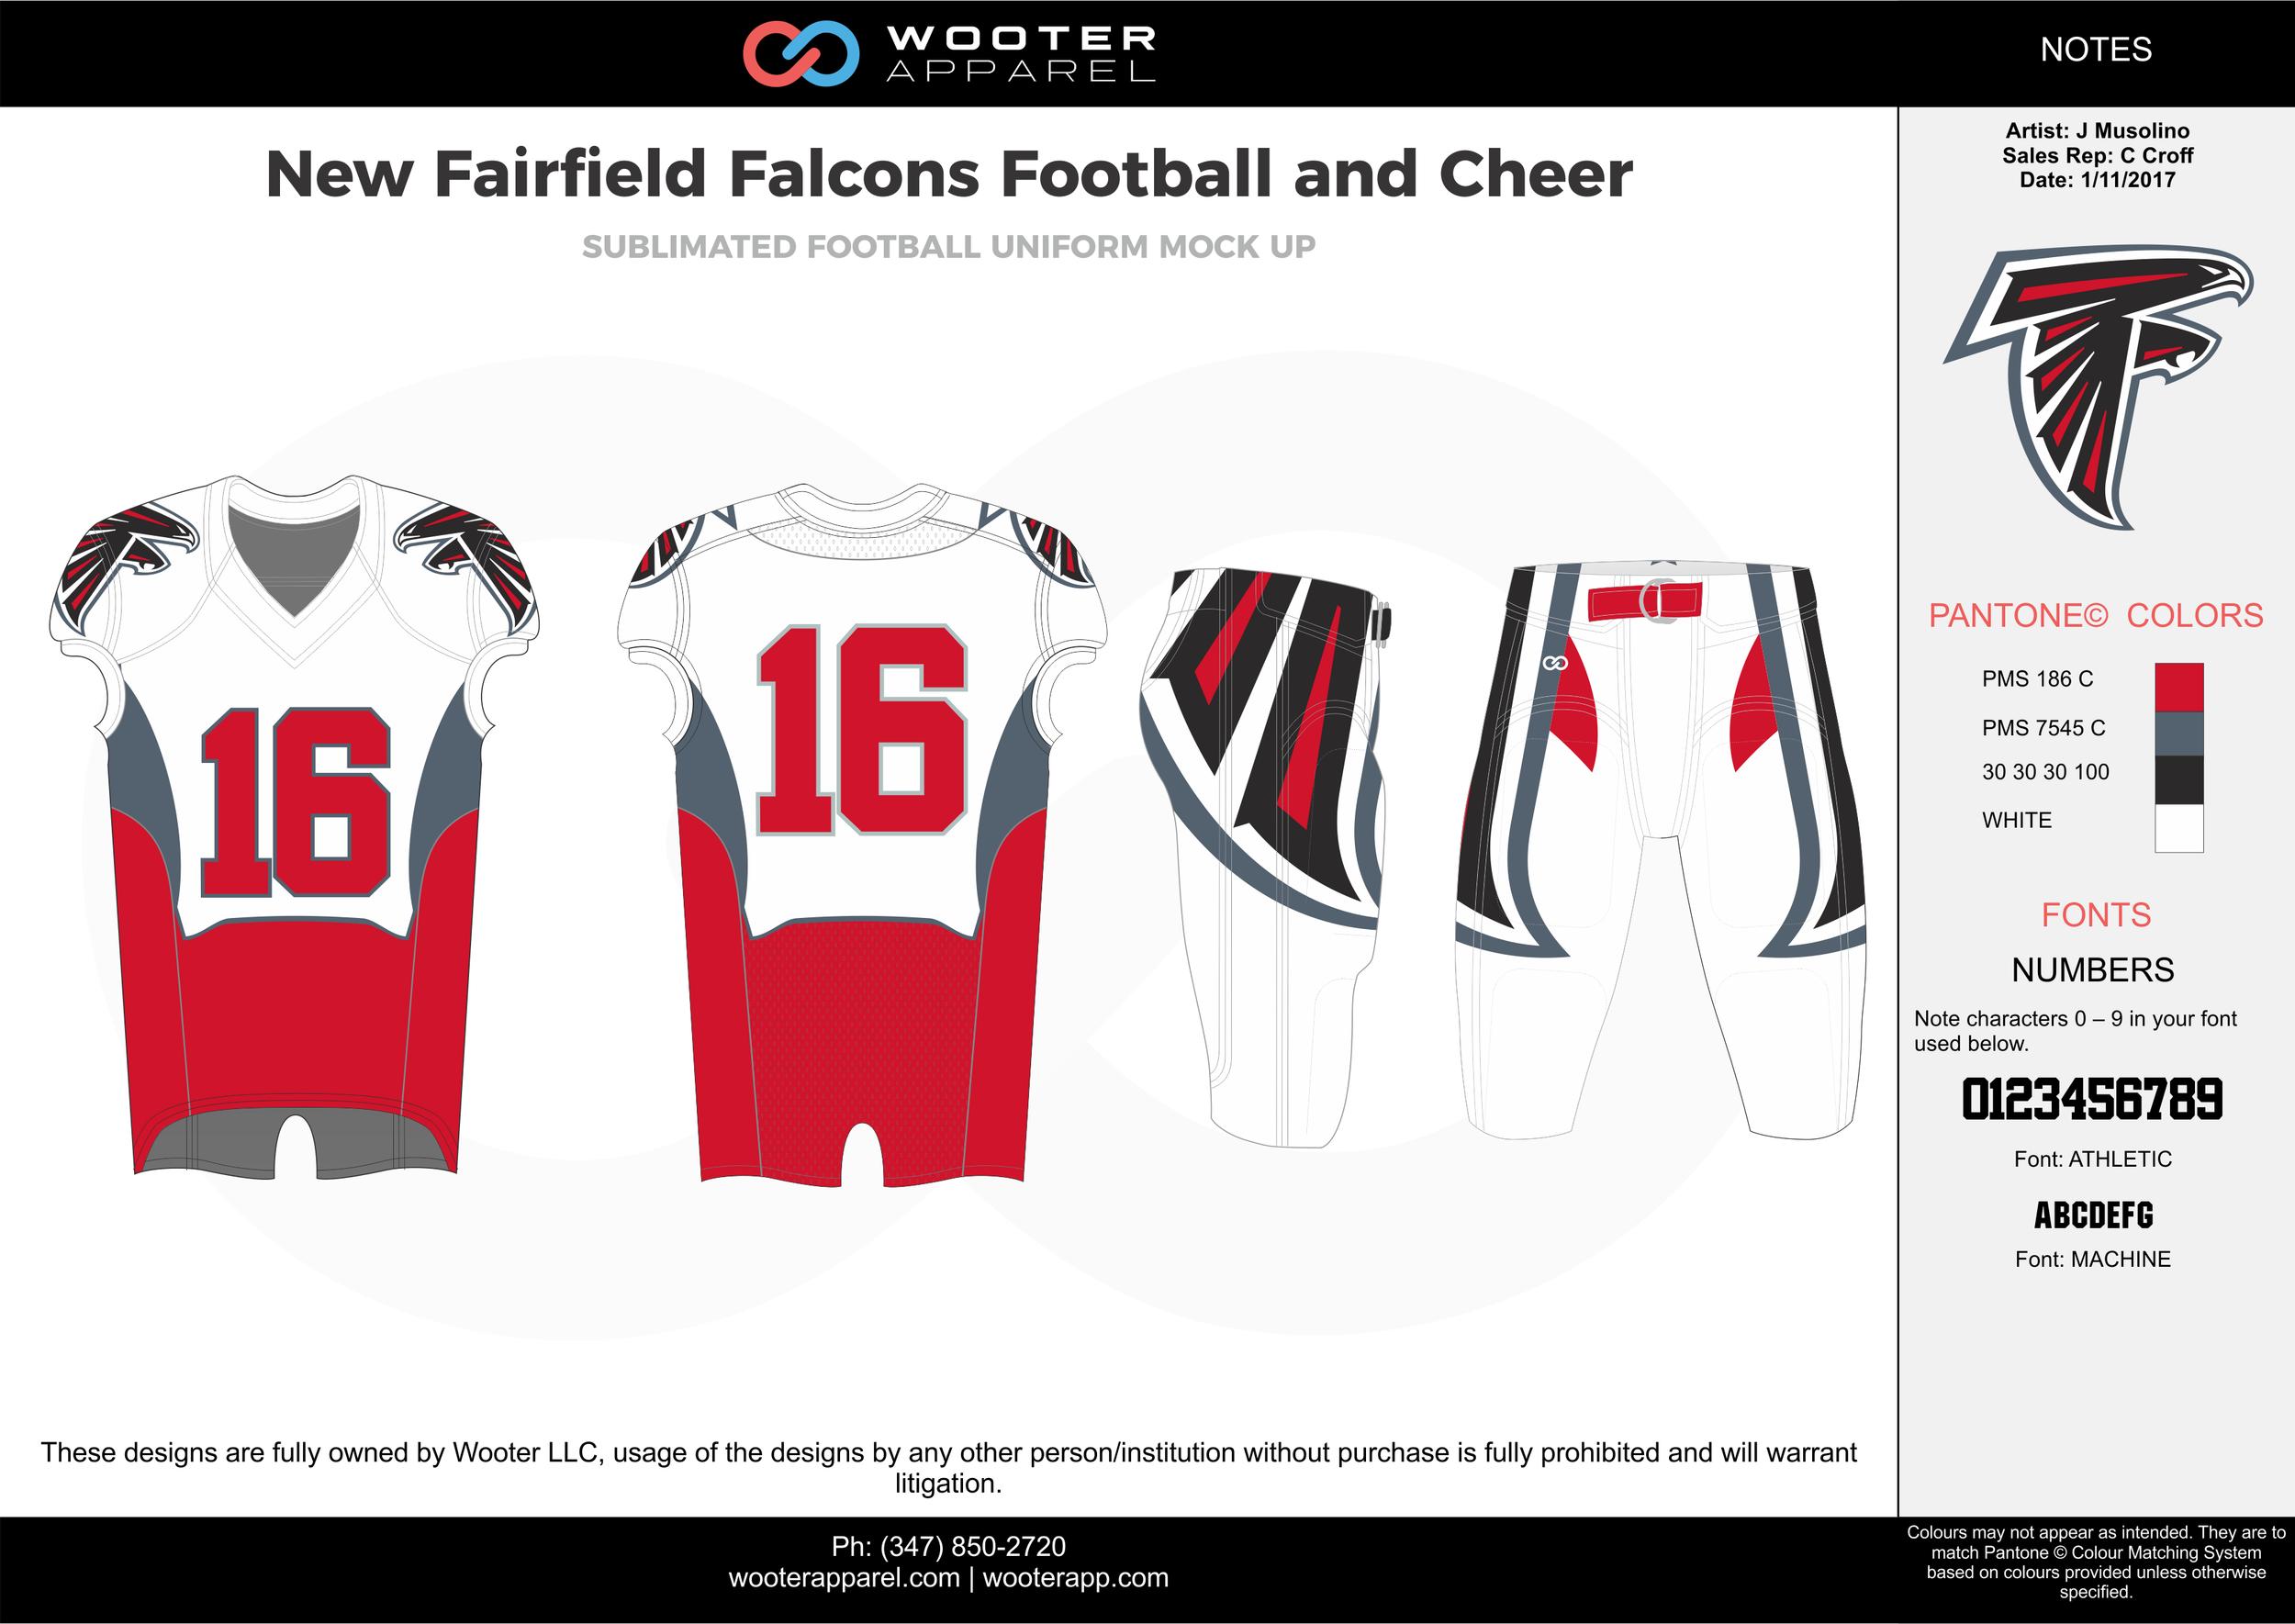 New Fairfield Falcons red white gray black football uniforms jerseys pants